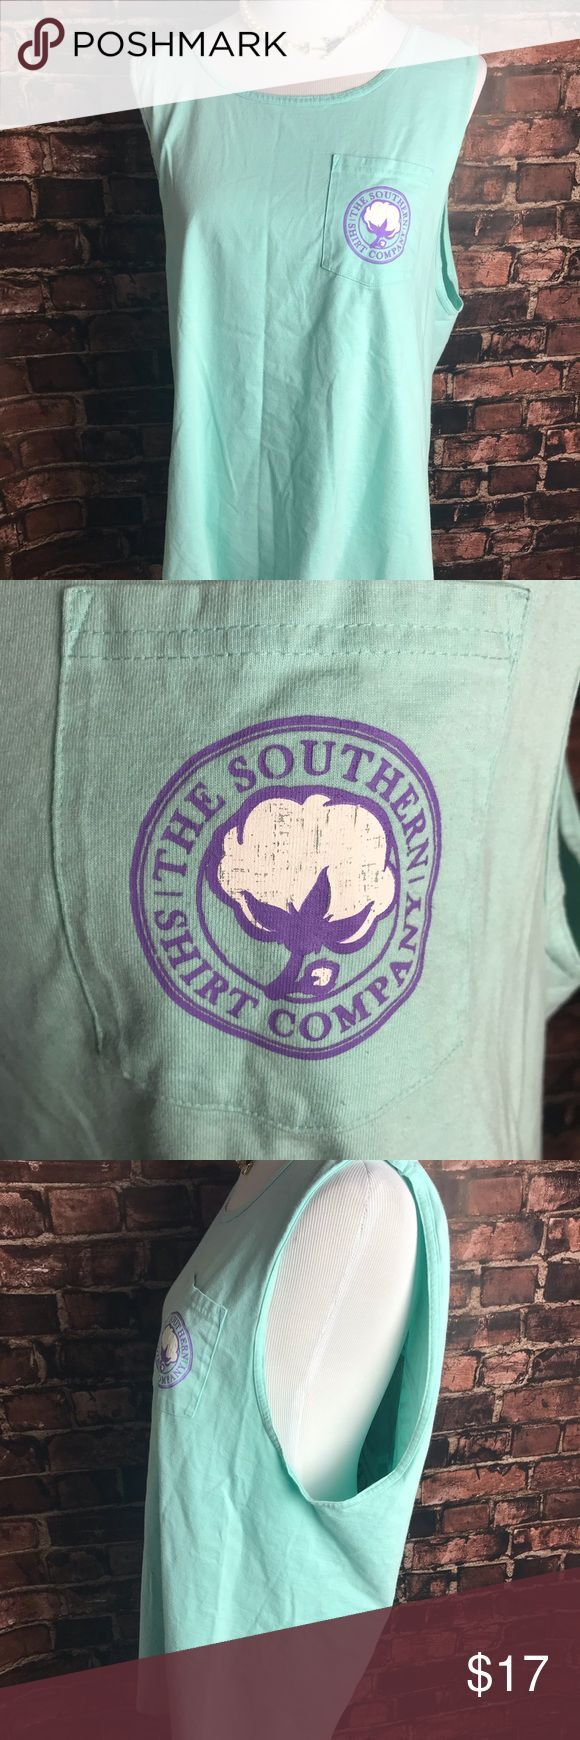 The Southern Shirt Company Cotton Logo Tank The Southern Shirt Company Cotton Lo…